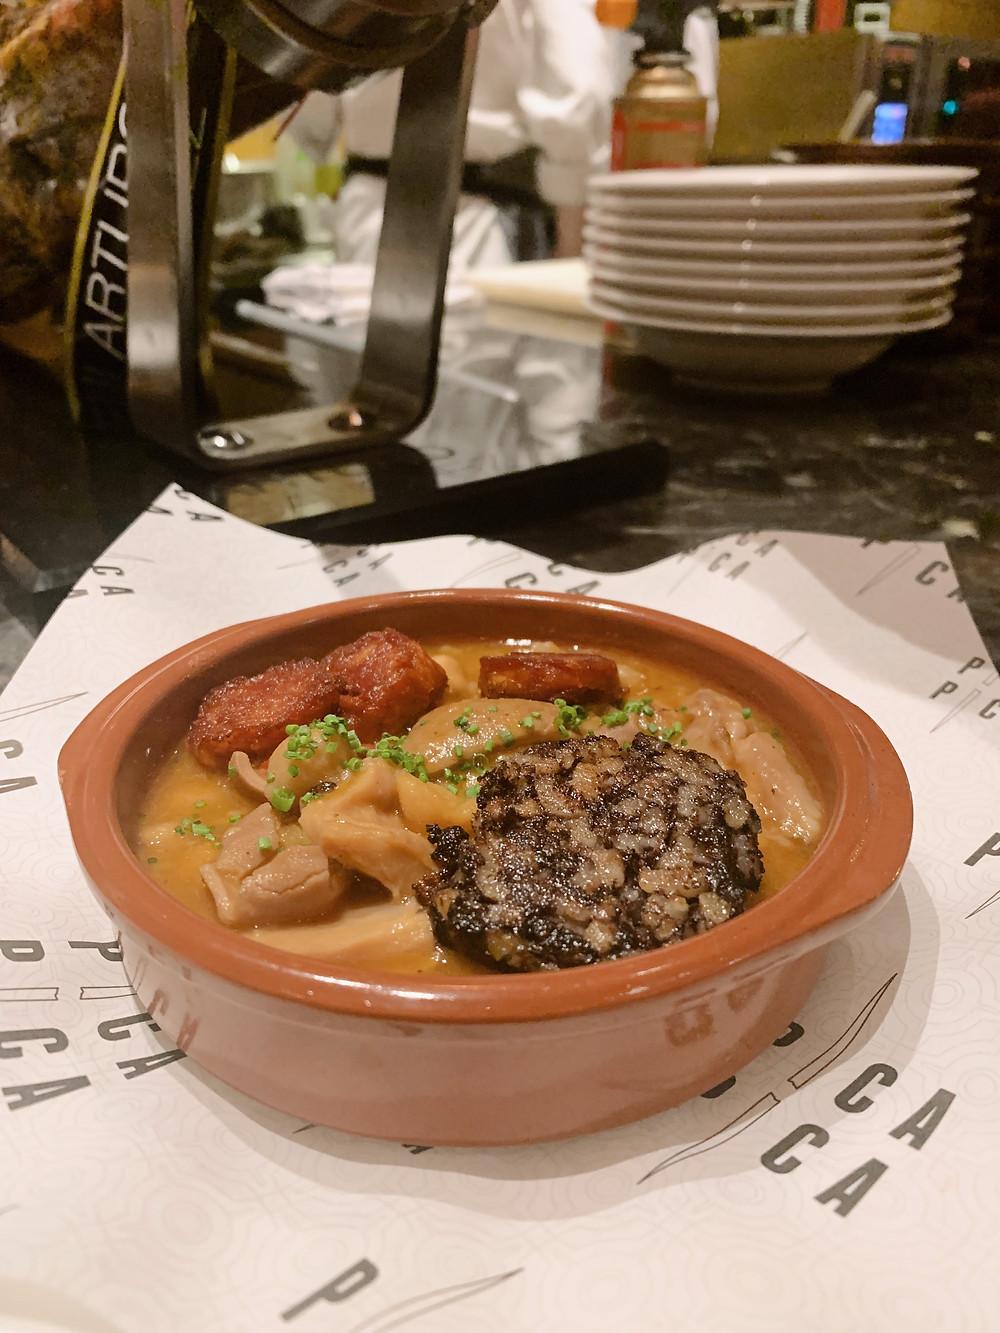 Food at Pica Pica restaurant in Hong Kong